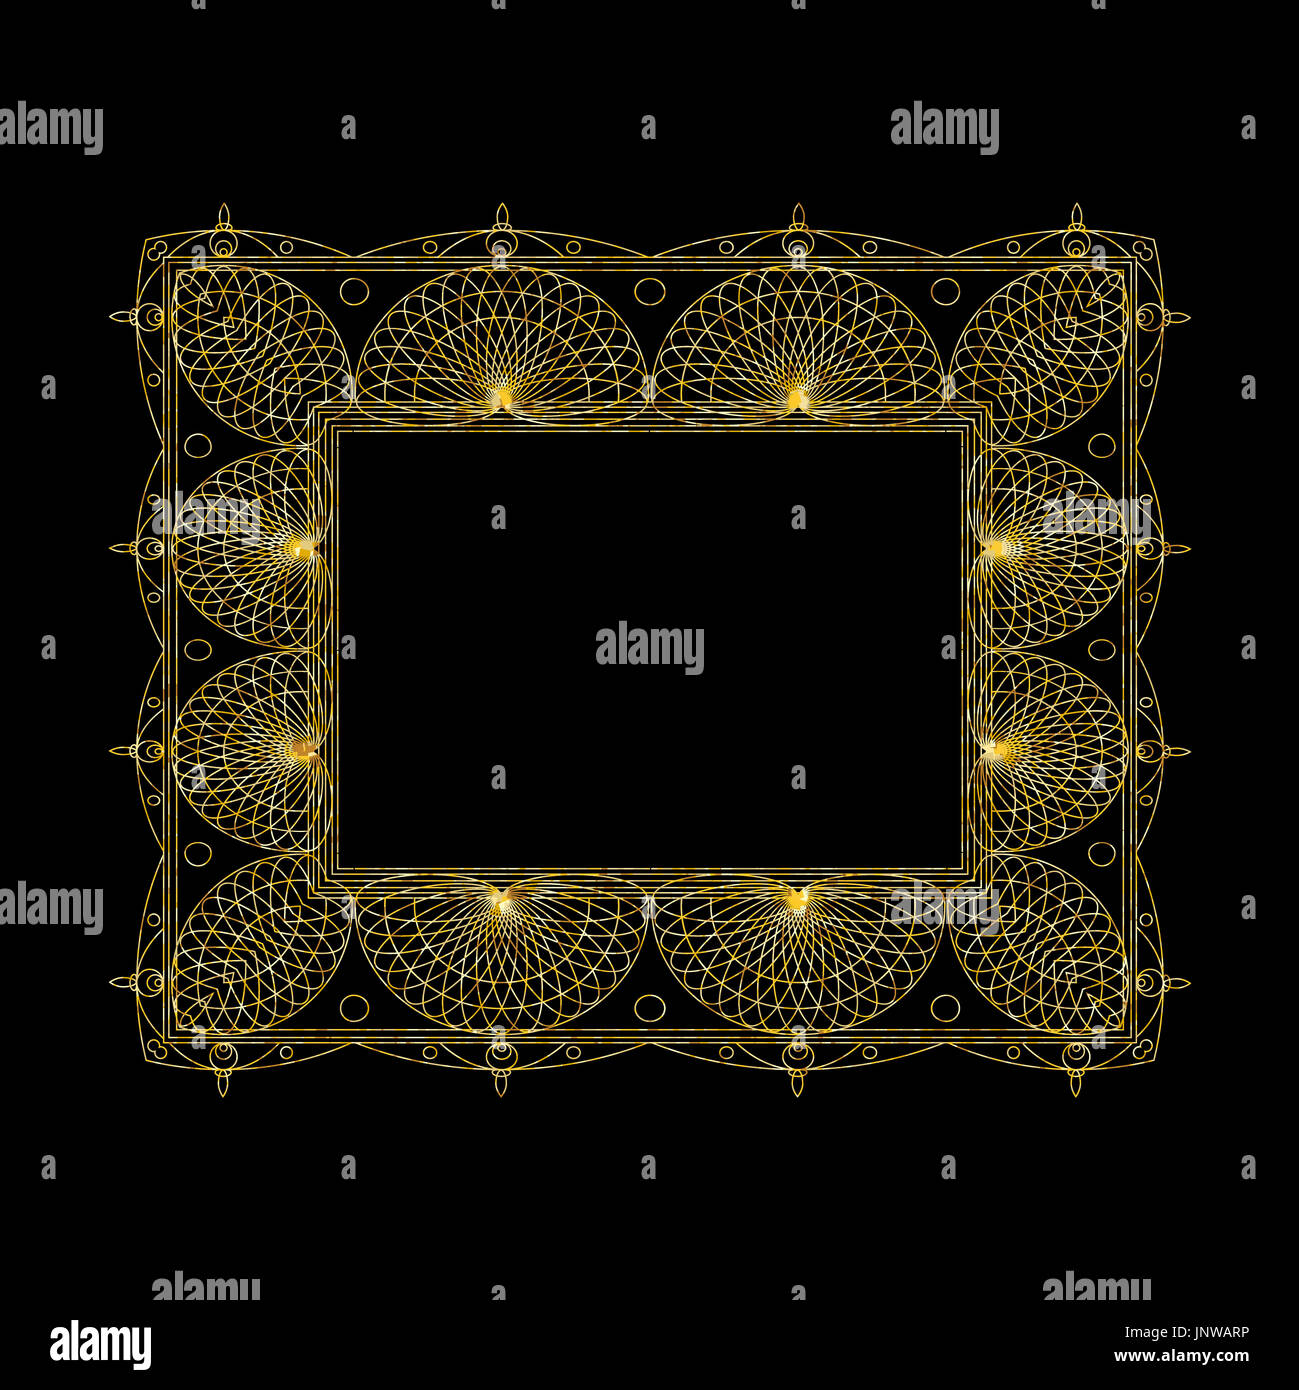 ornate gold frame border.  Ornate Set Of Ornate Line Art Frames And Borders Gold Outline Elements For  Invitations Or Greeting Cards With Ornate Frame Border